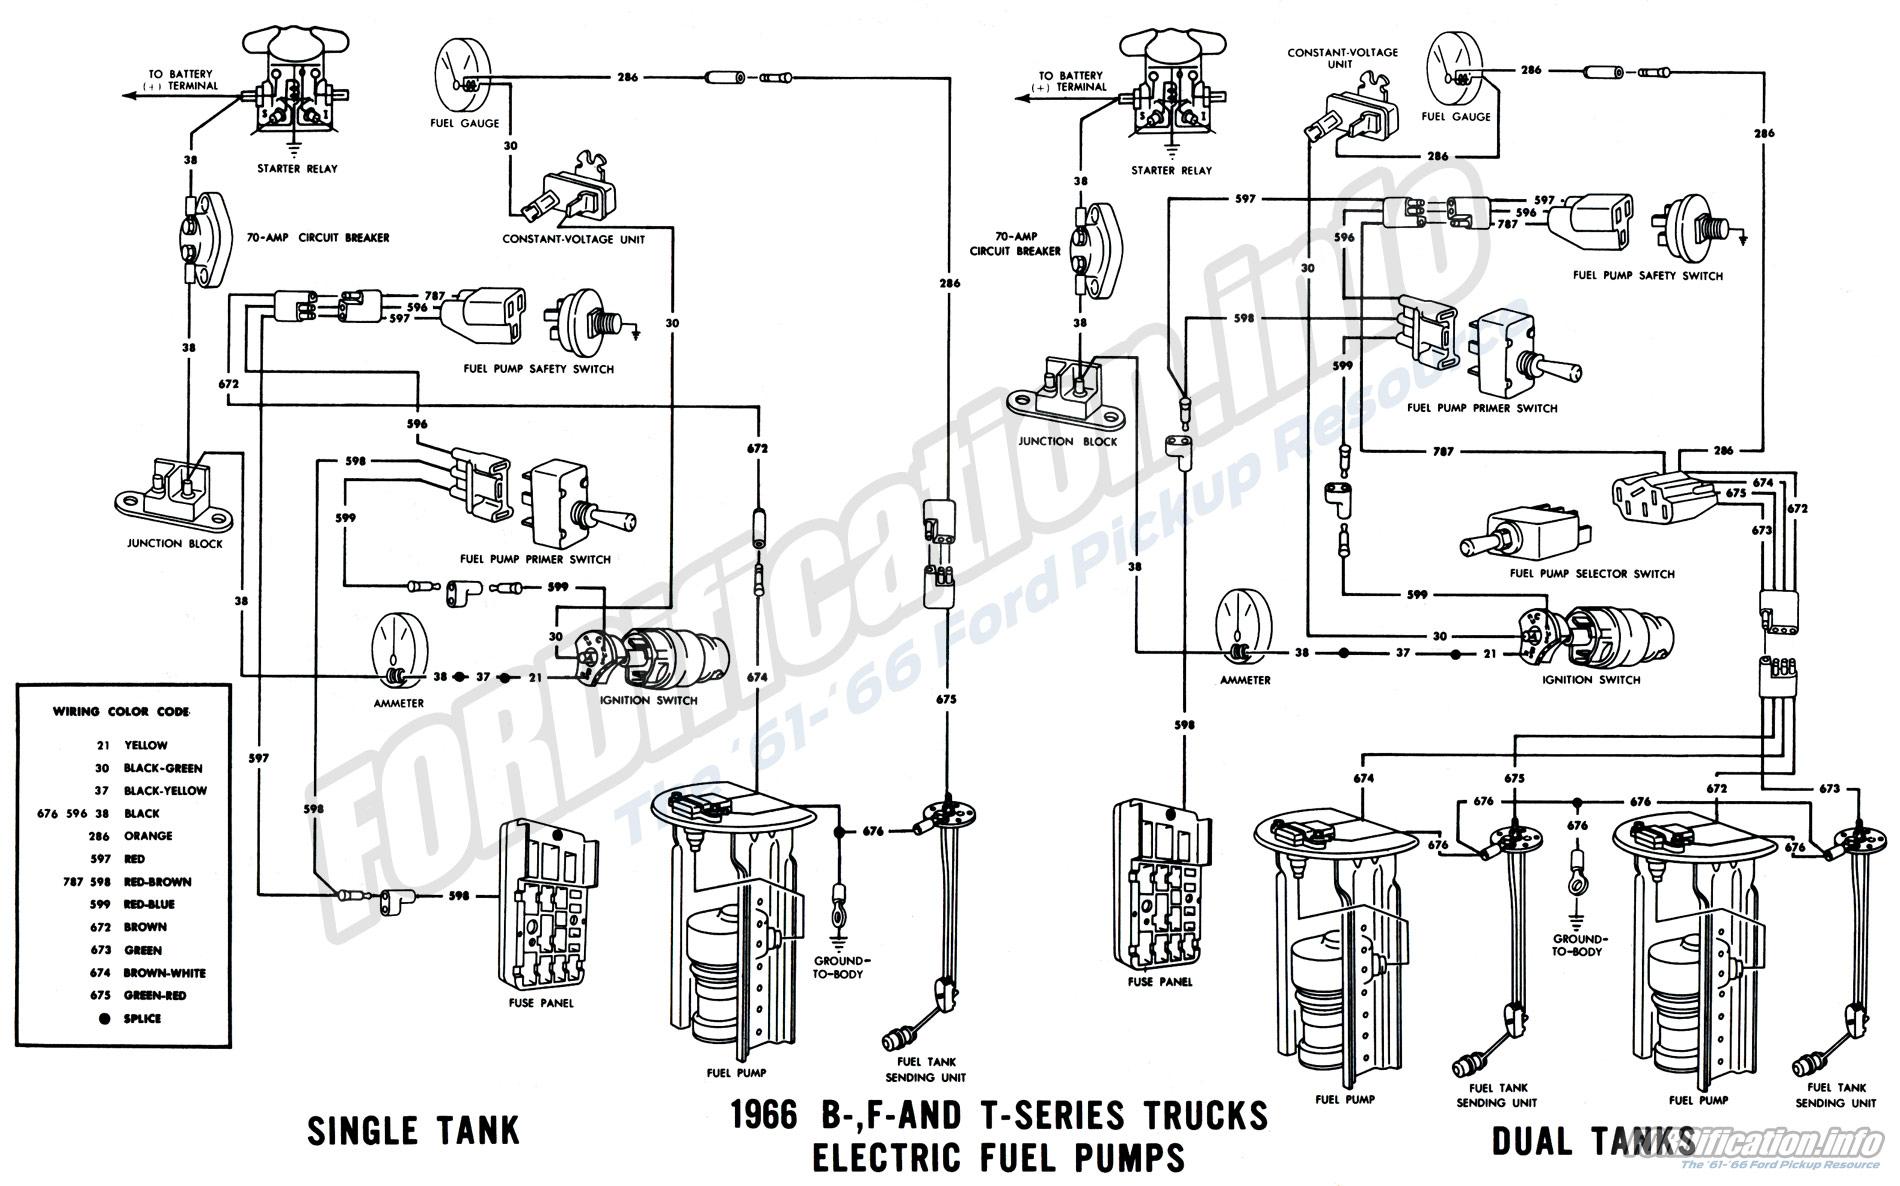 hight resolution of triumph tr6 vacuum diagram imageresizertool com triumph spitfire 1500 wiring diagram 1975 triumph spitfire wiring diagram